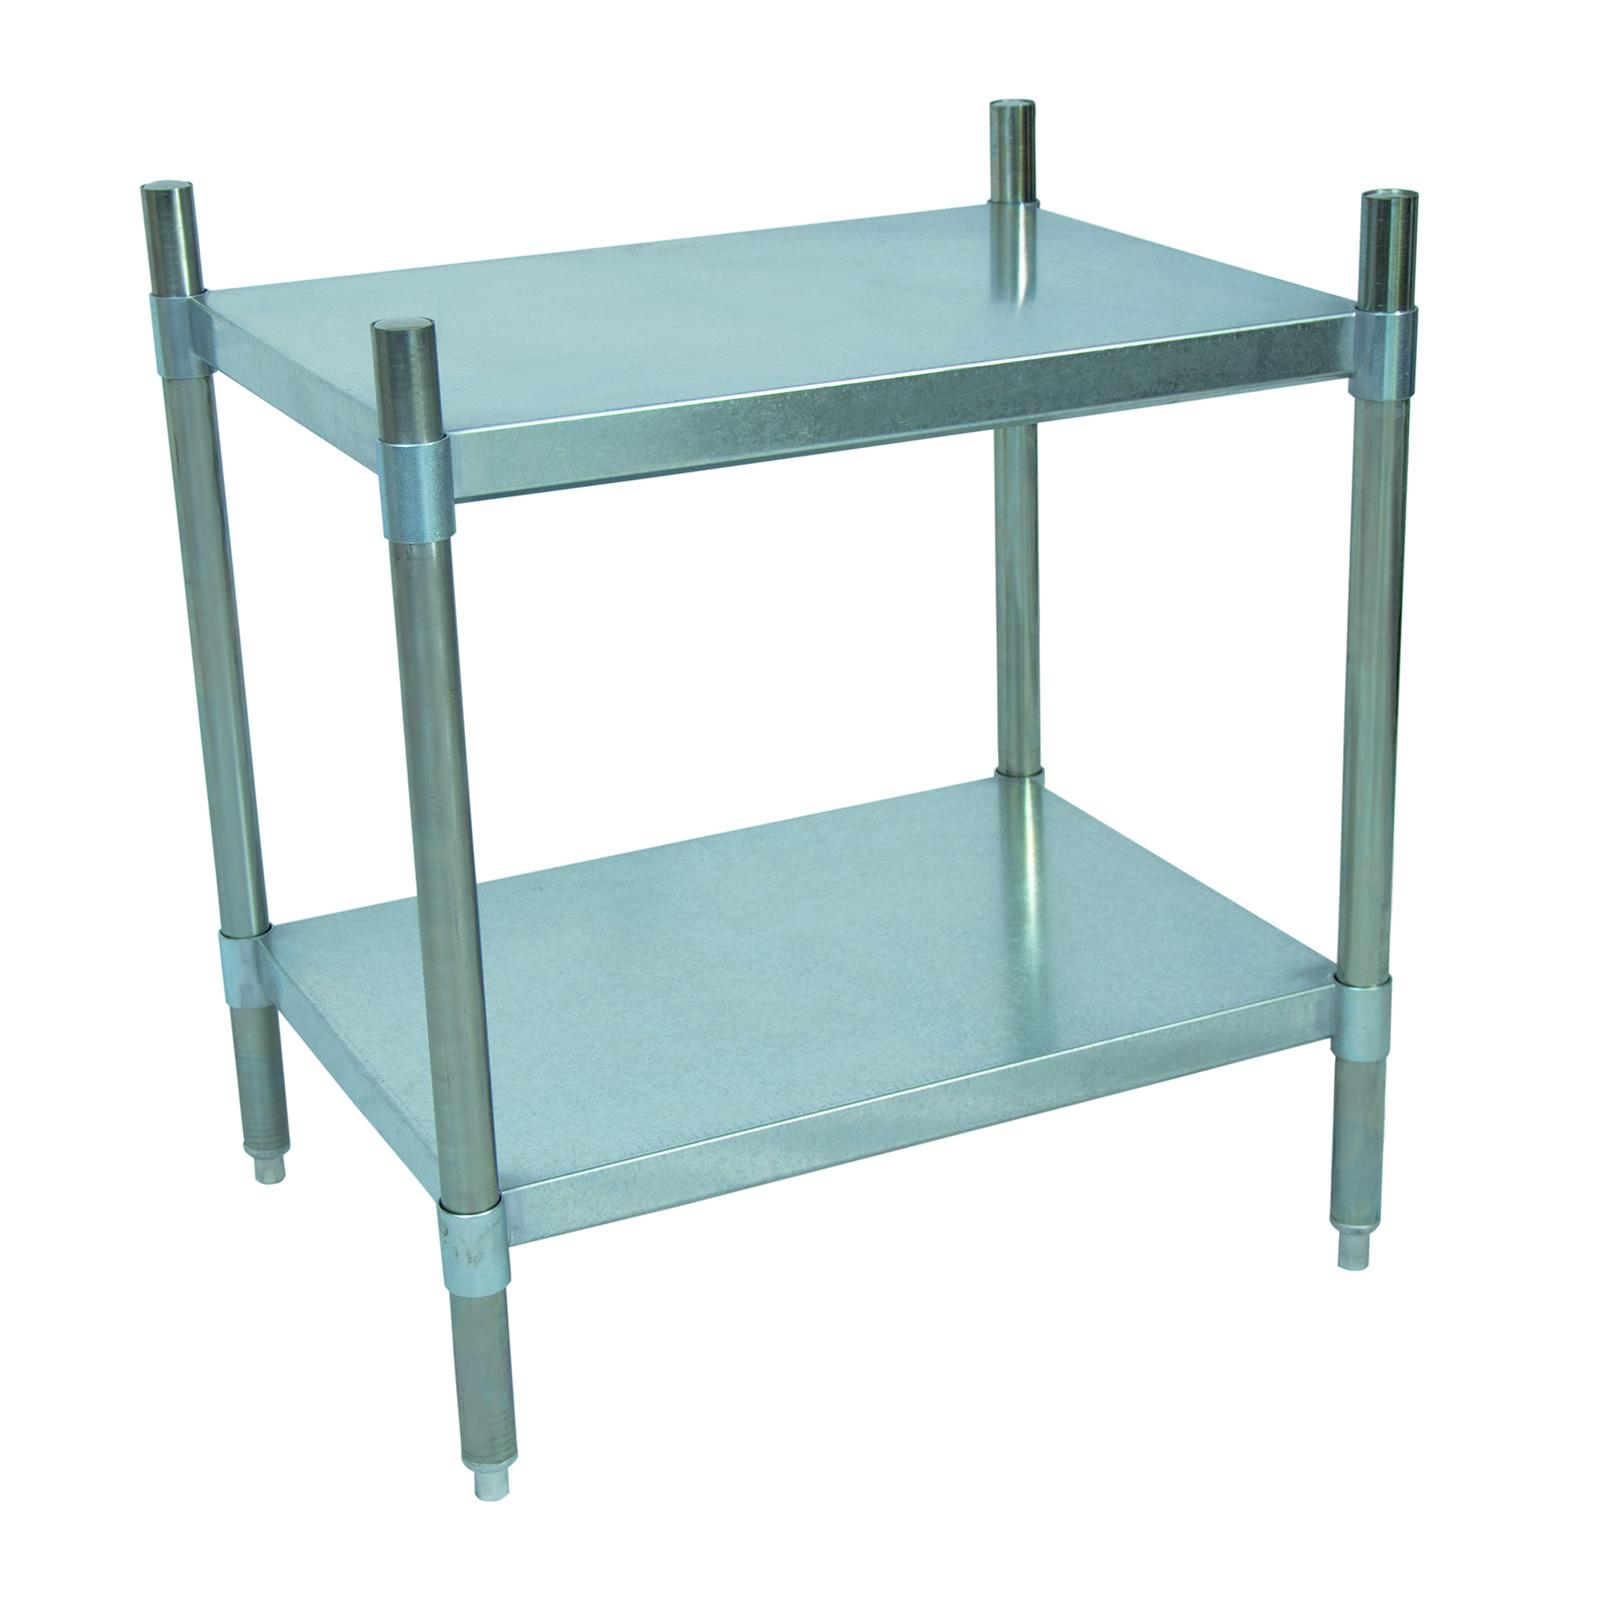 BK Resources VSU3-4324 shelving unit, solid flat